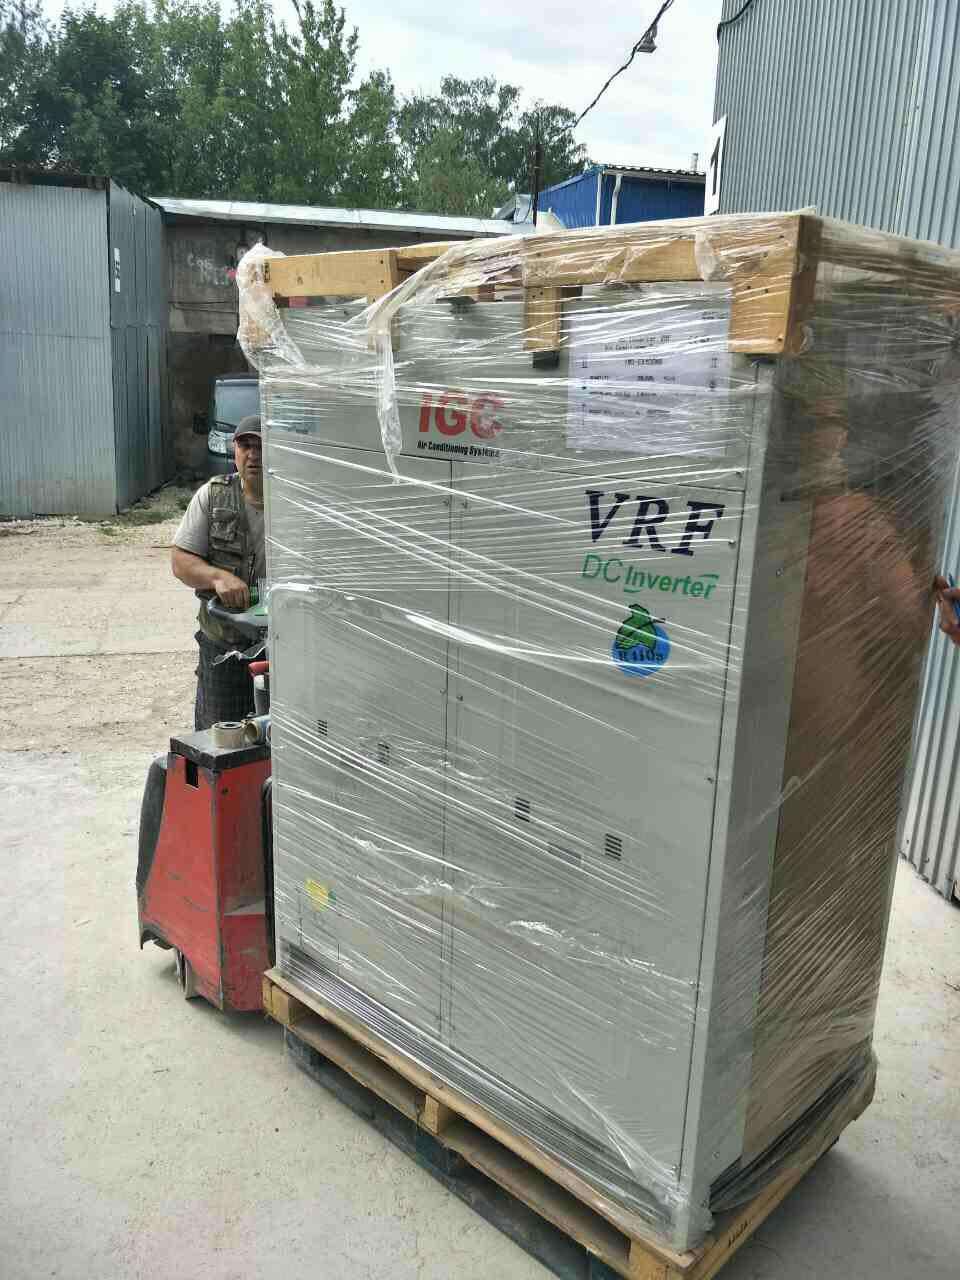 Vrf системы IGC